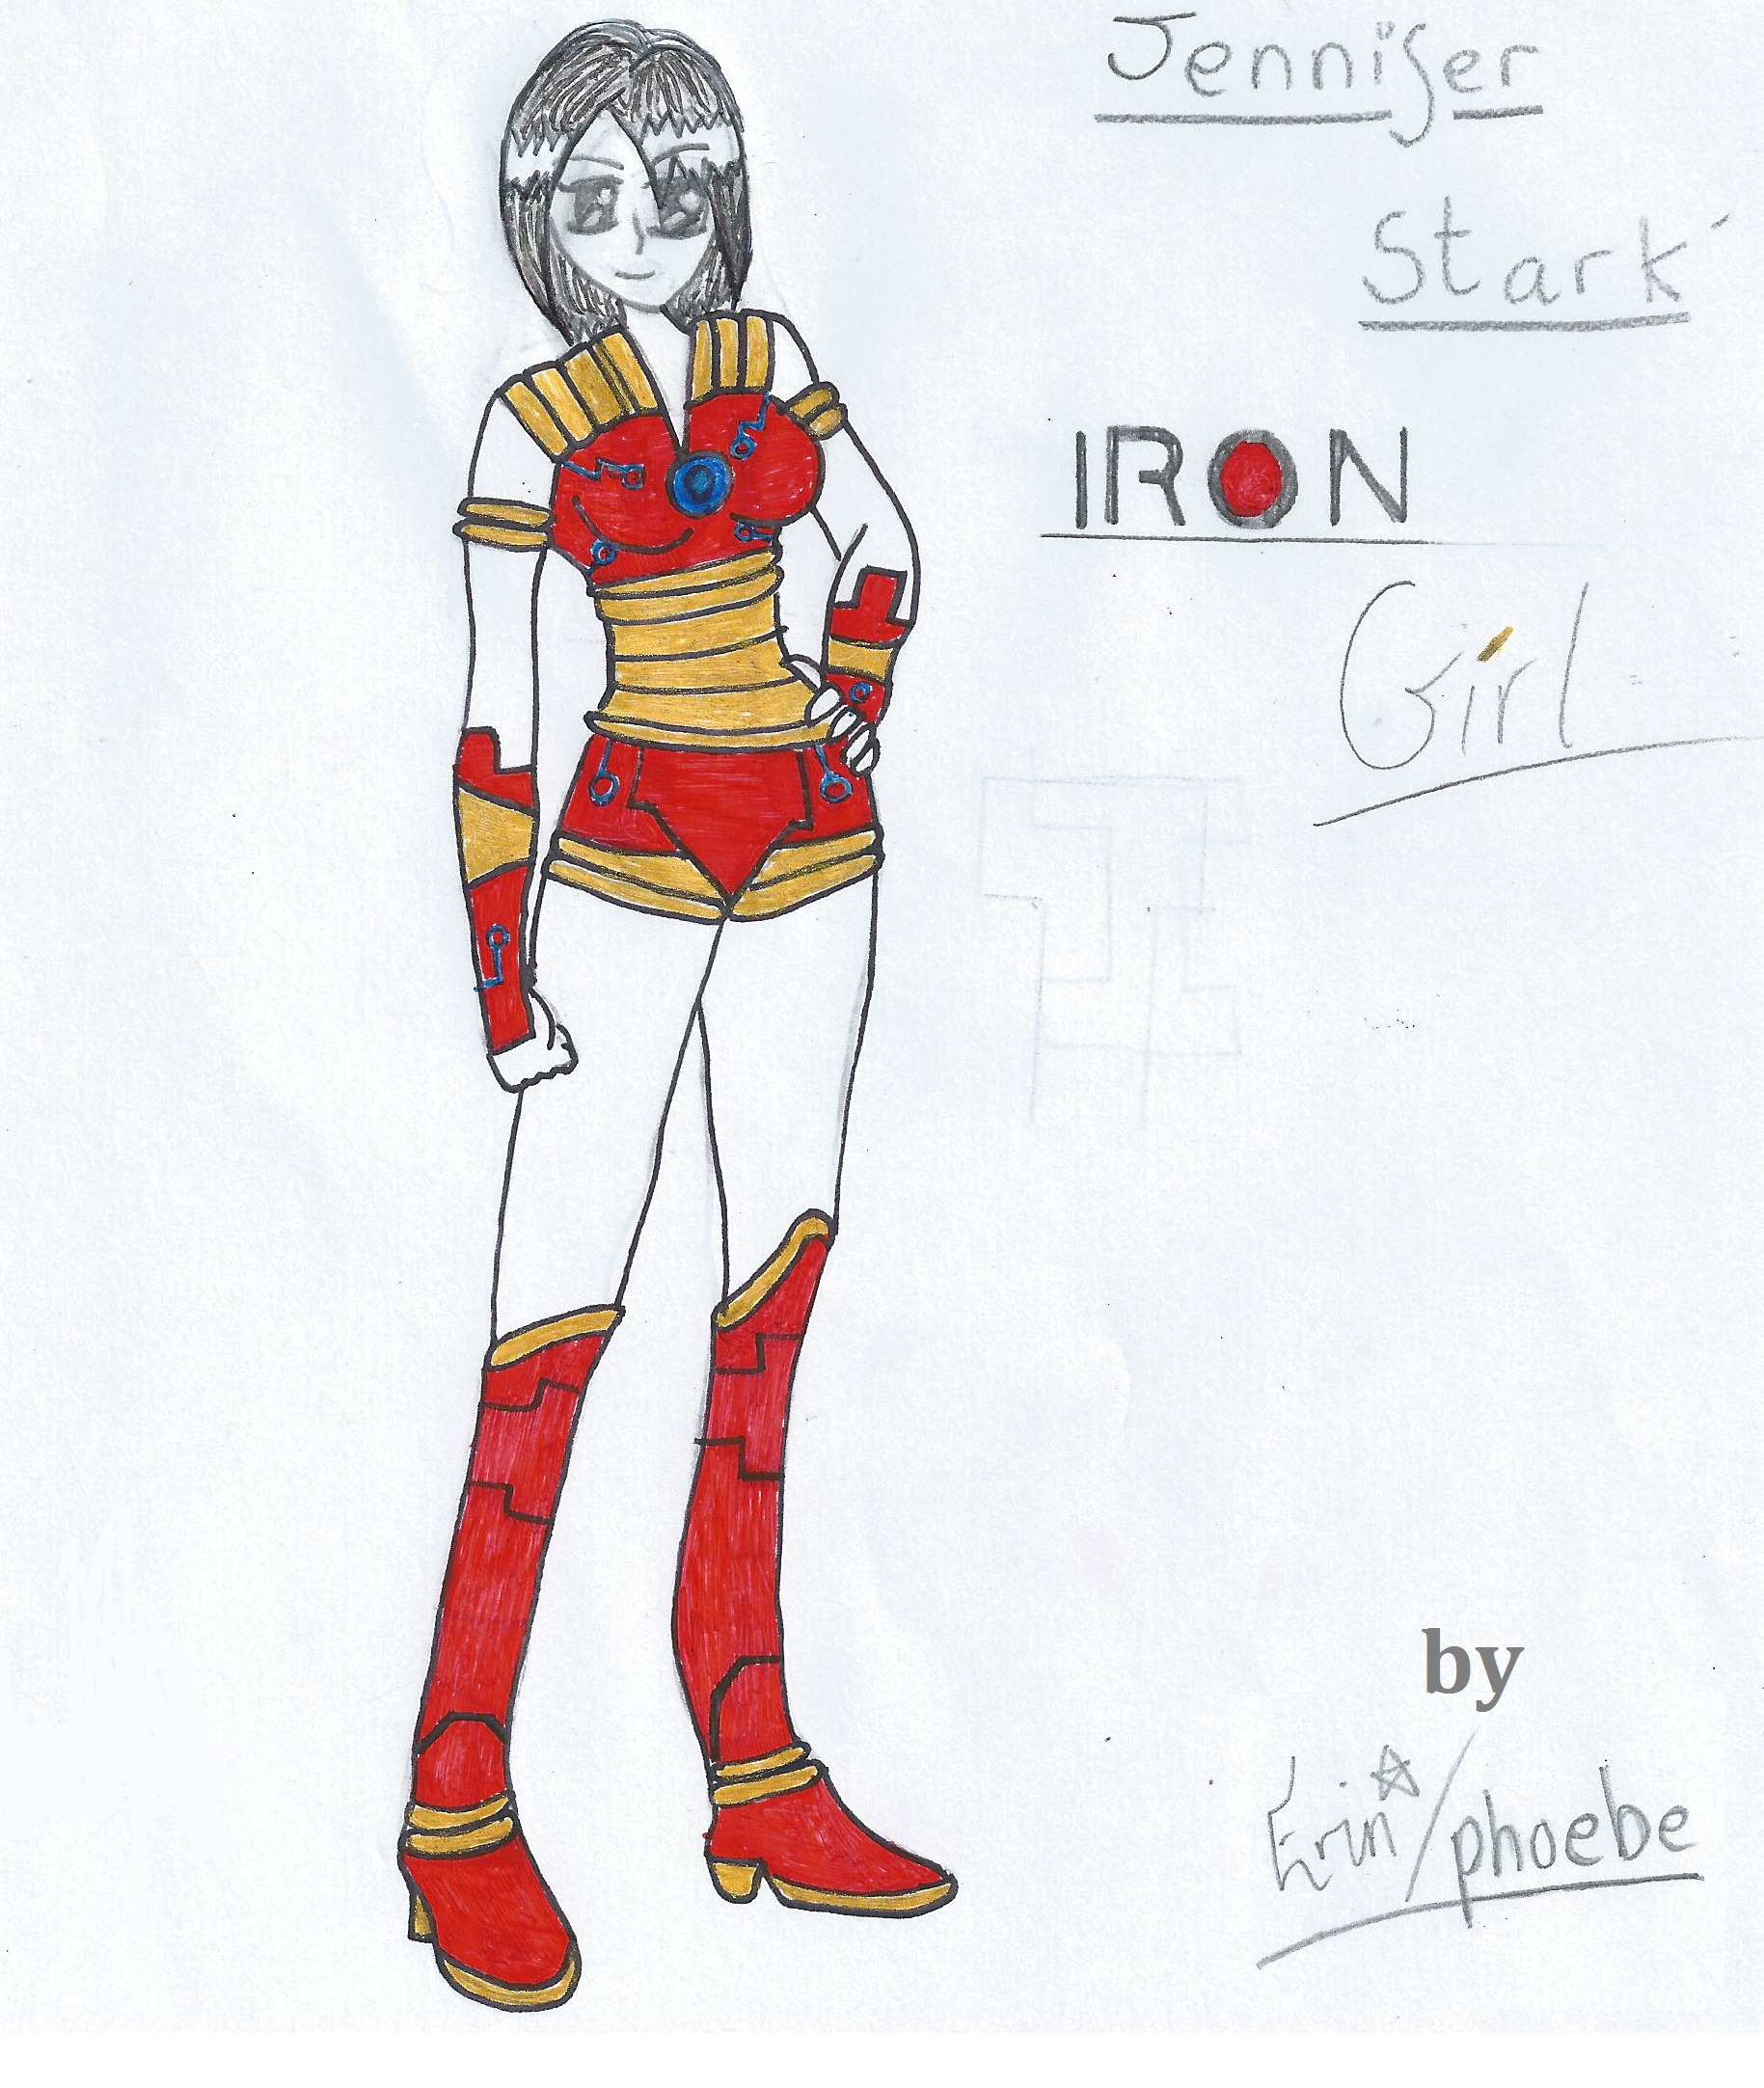 My new OC Iron Girl/Jennifer Stark